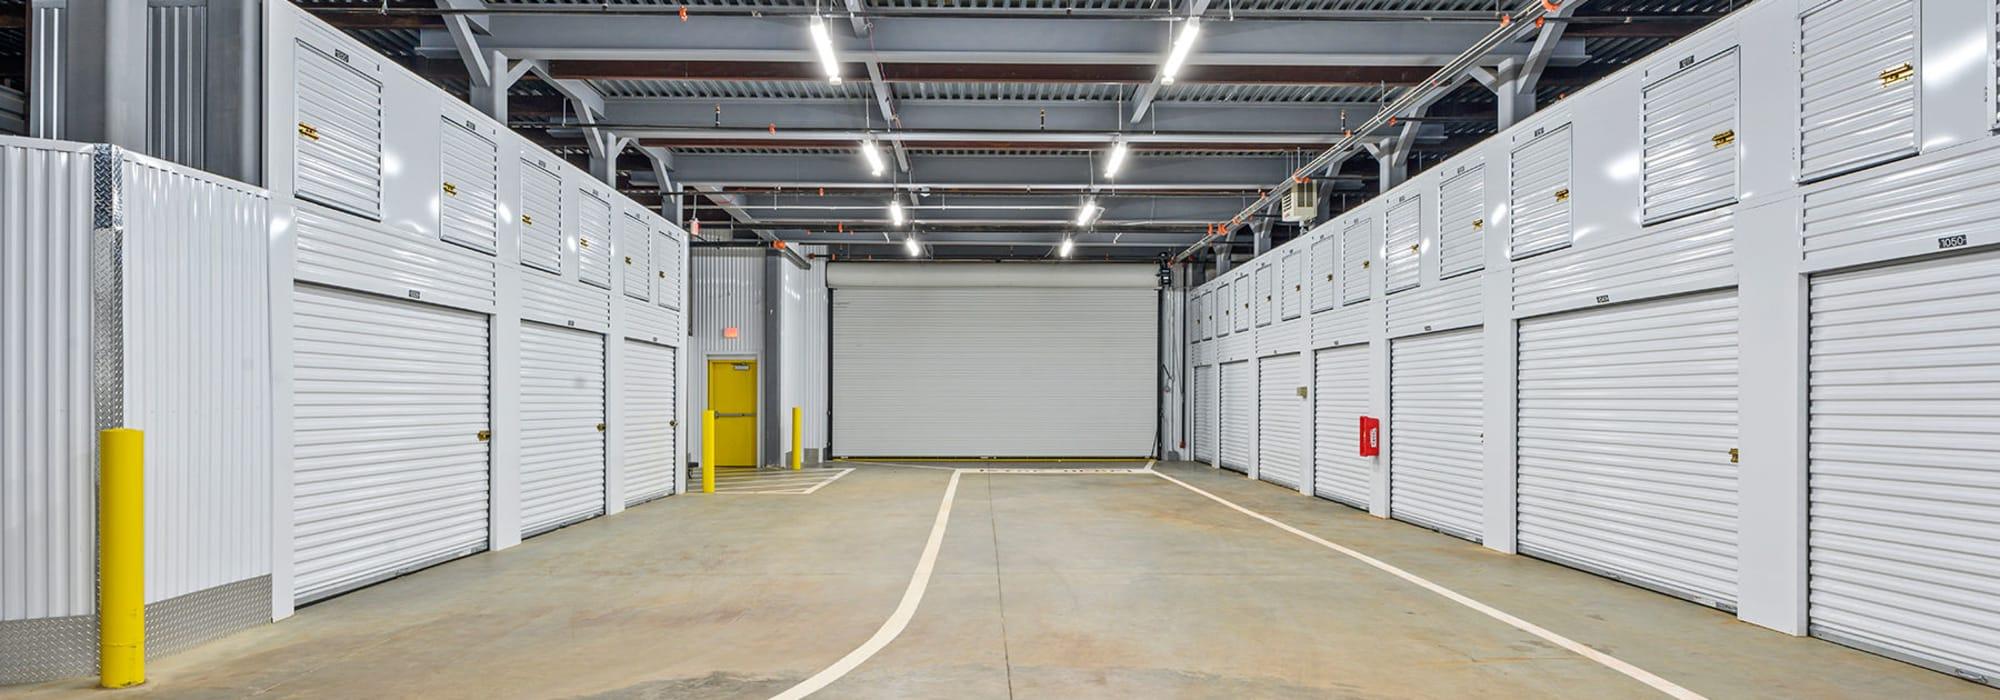 Storage 365 self storage in Euless, Texas